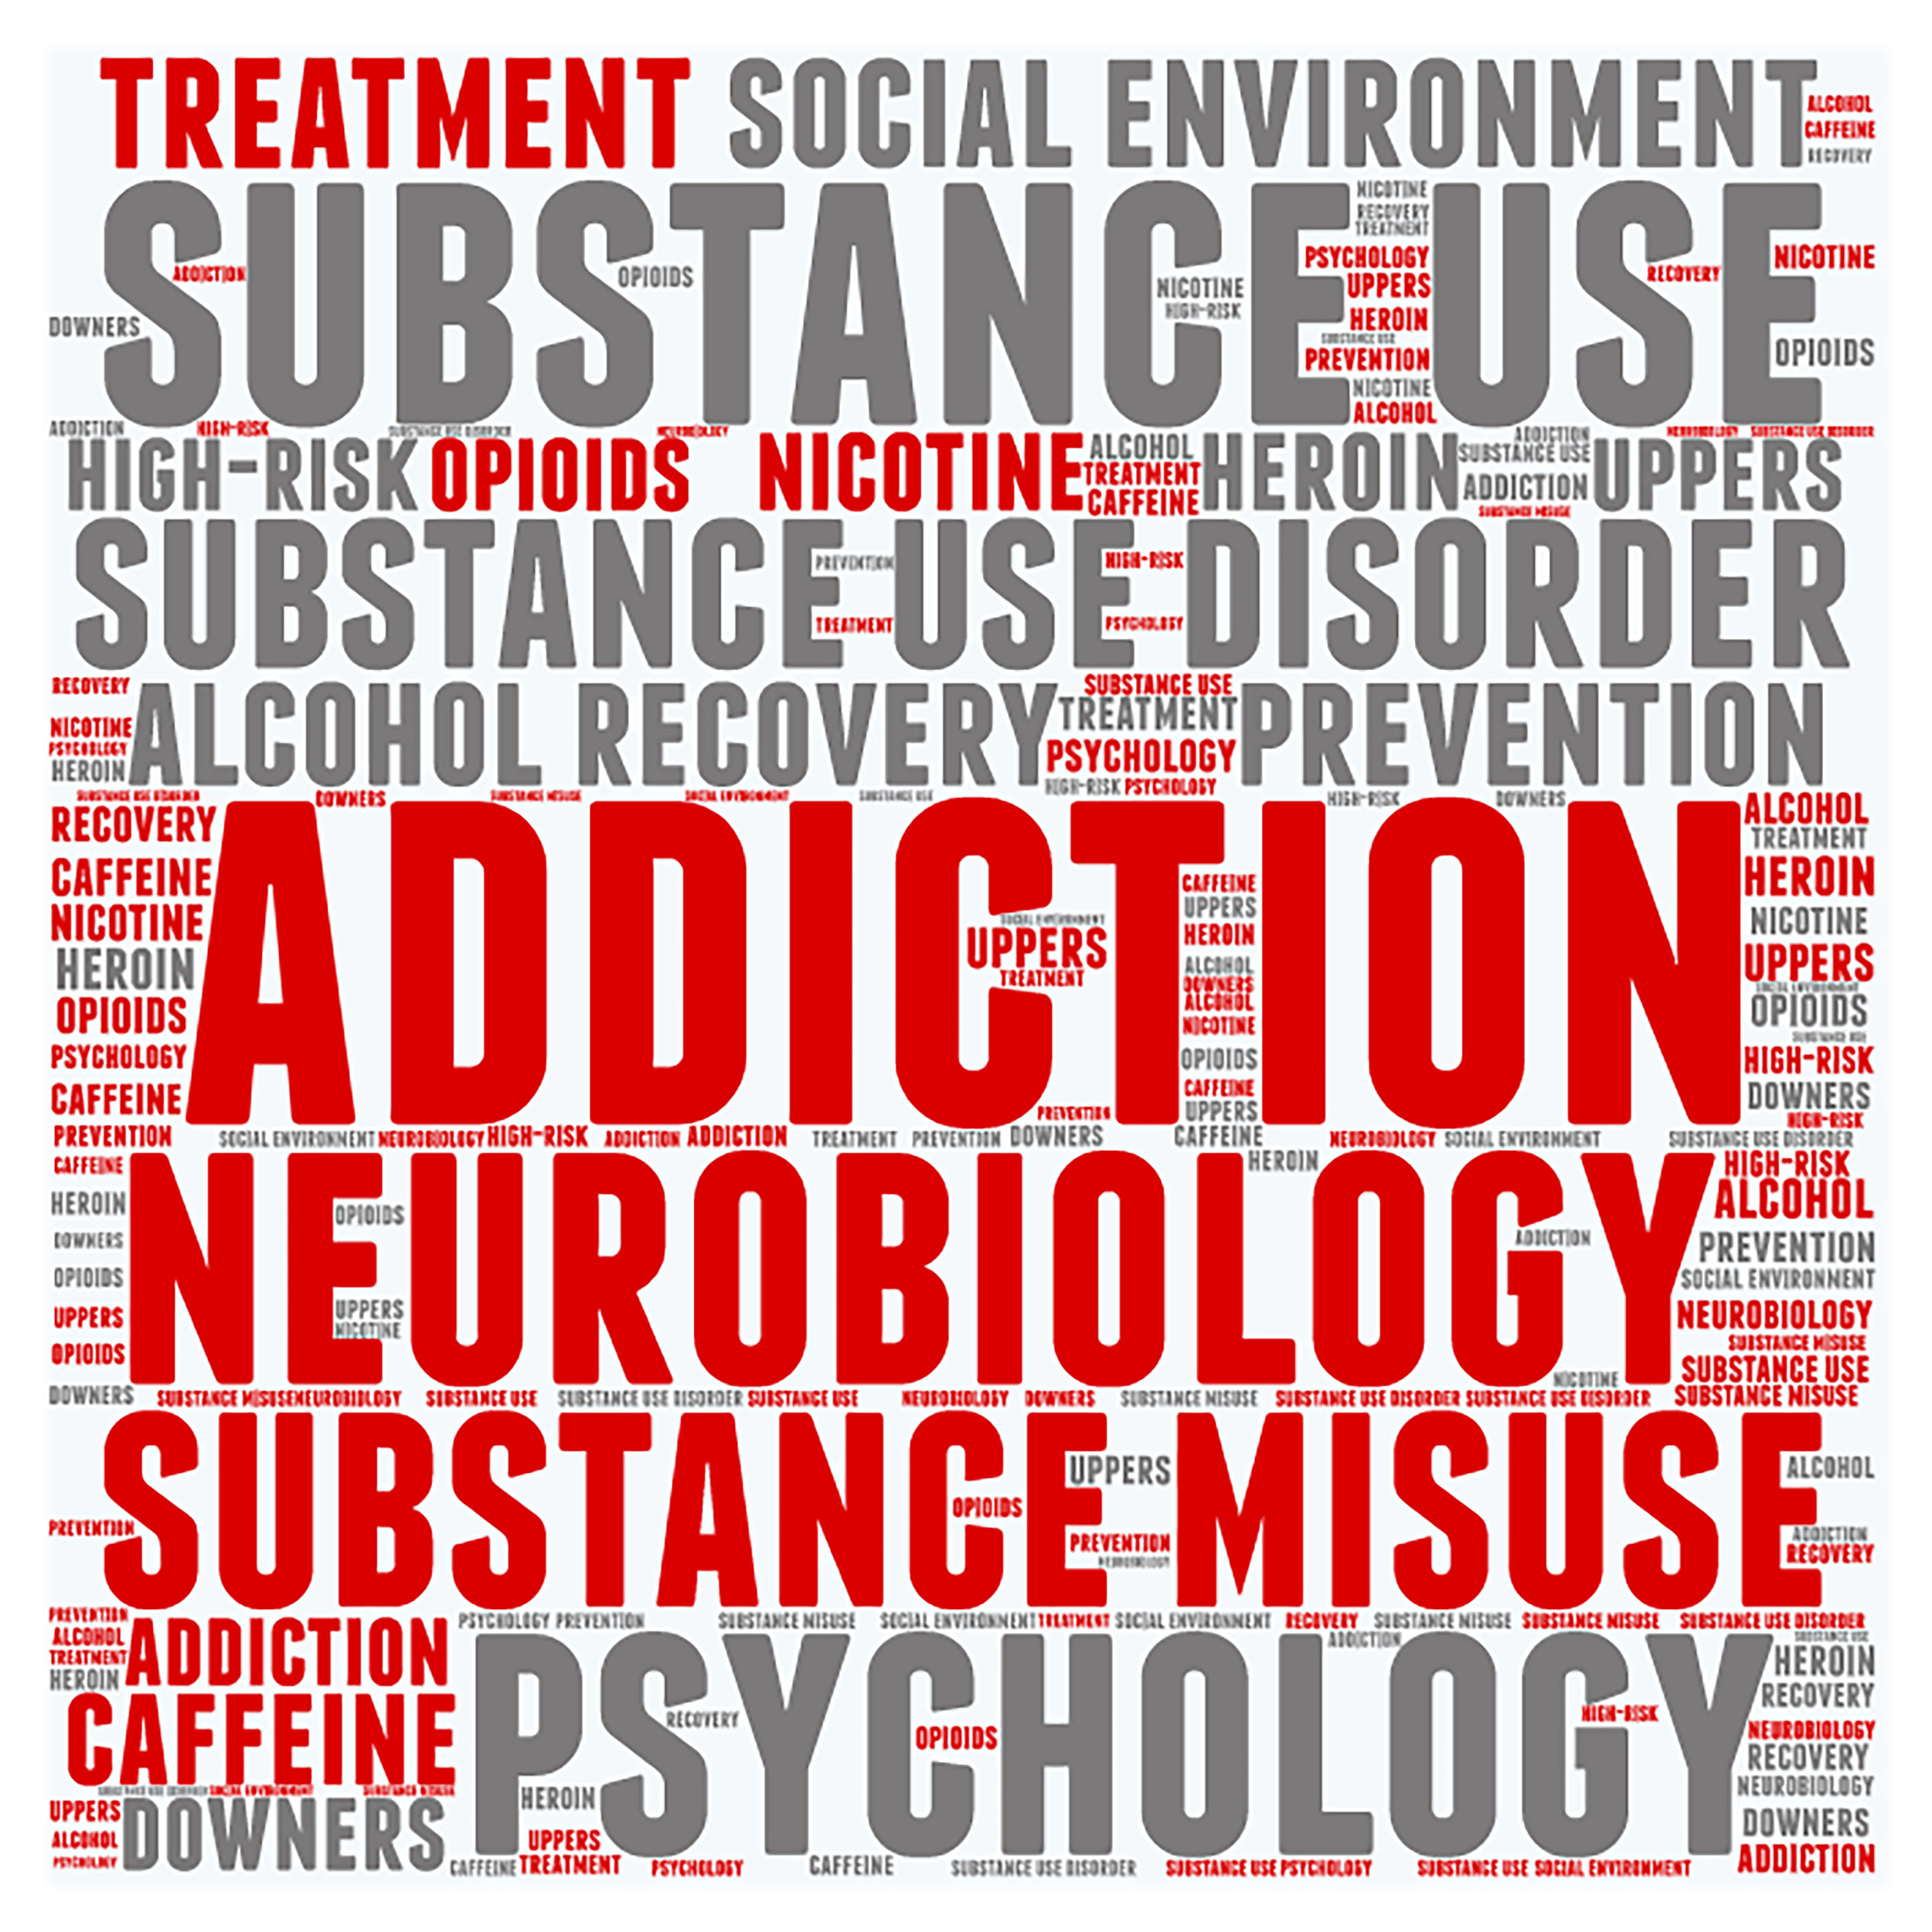 Cover image for SWK 3805: Marijuana, Hallucinogens, Inhalants, and Steroids